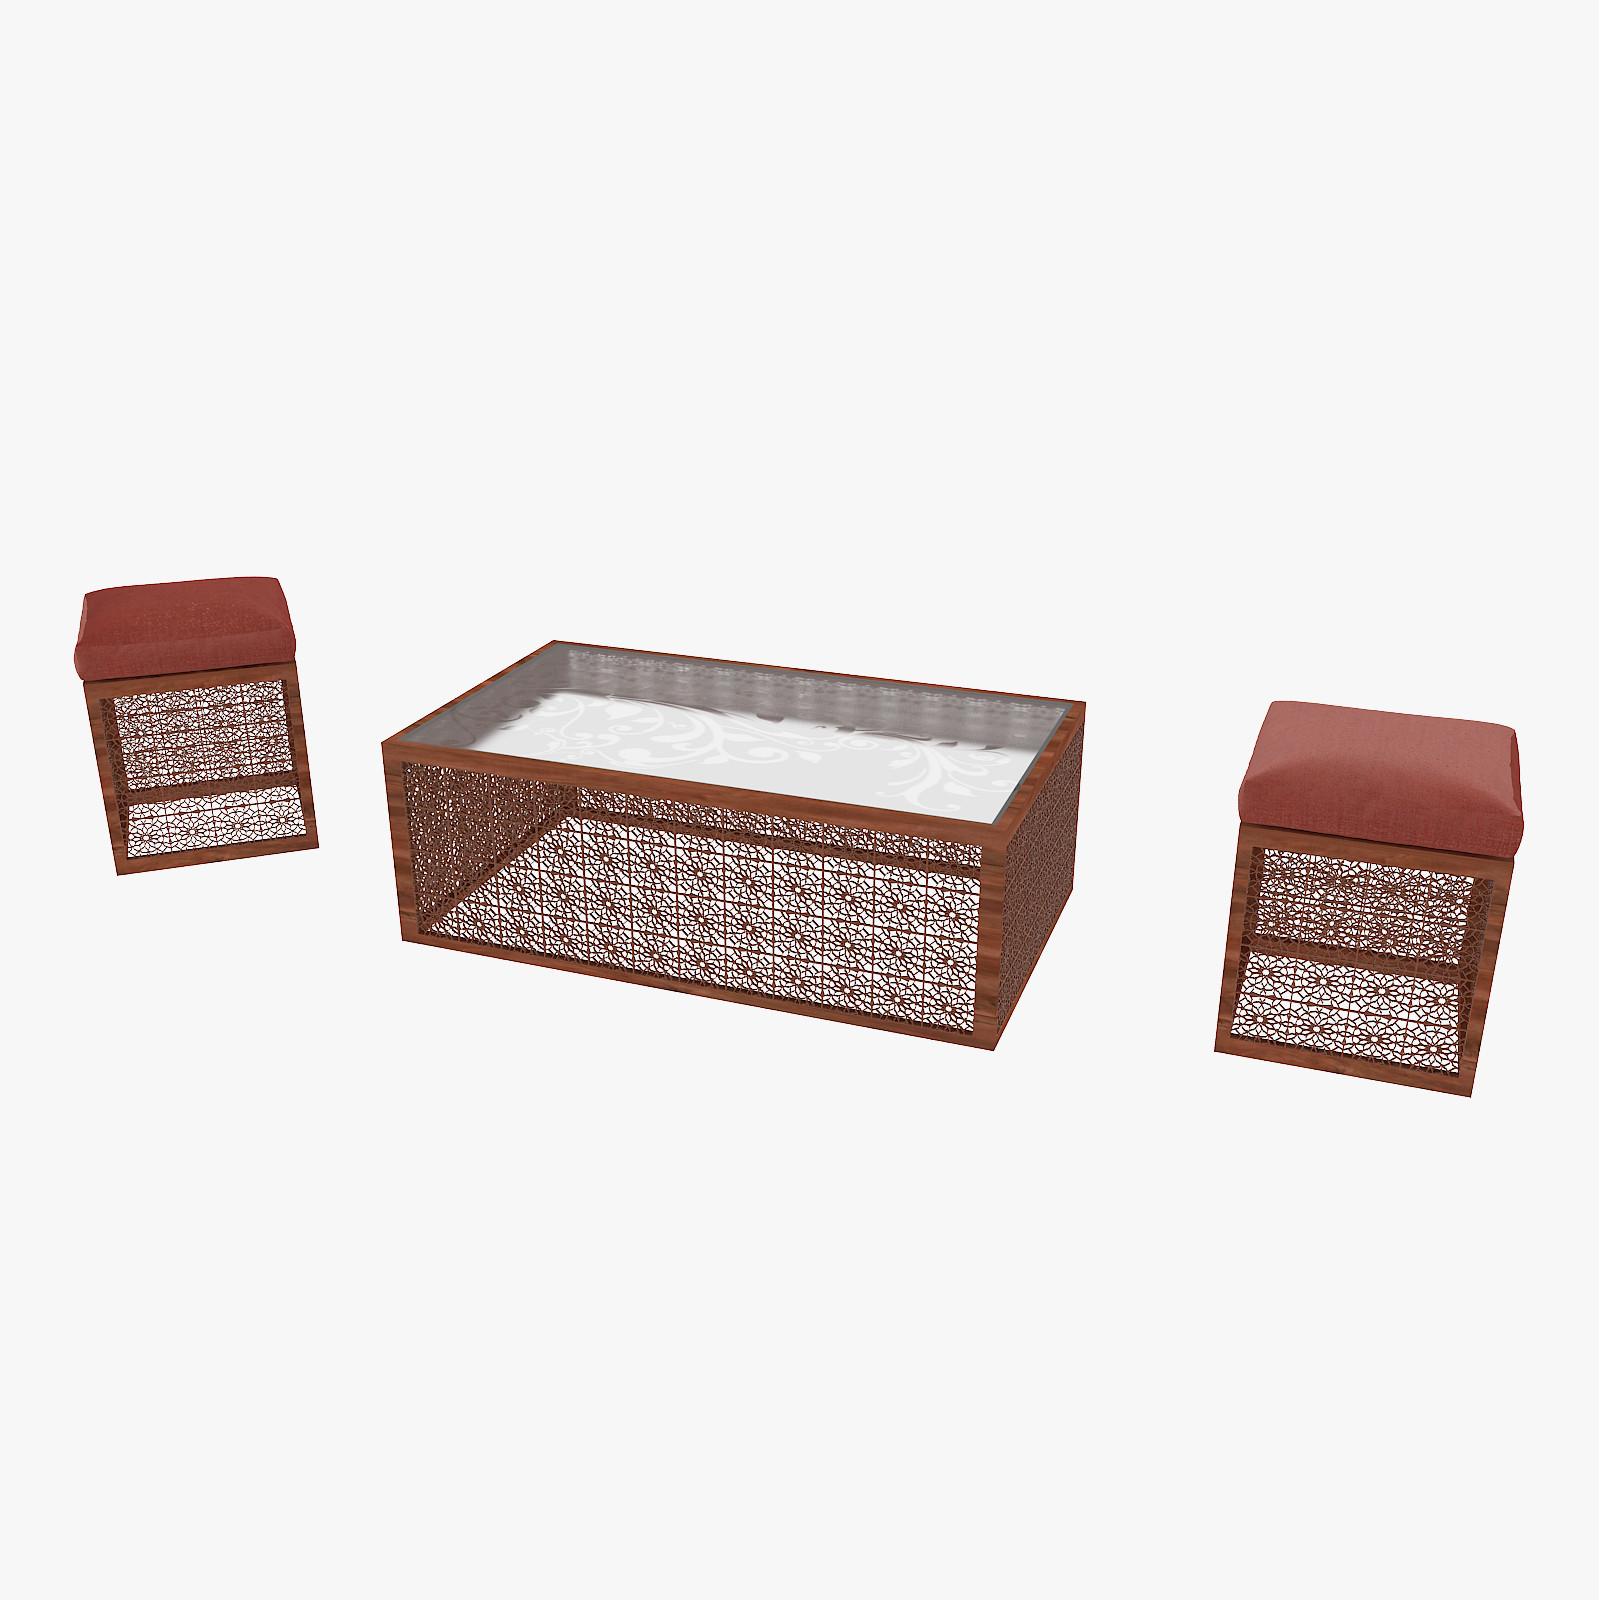 Arabesque_cubic_furniture_01.jpg